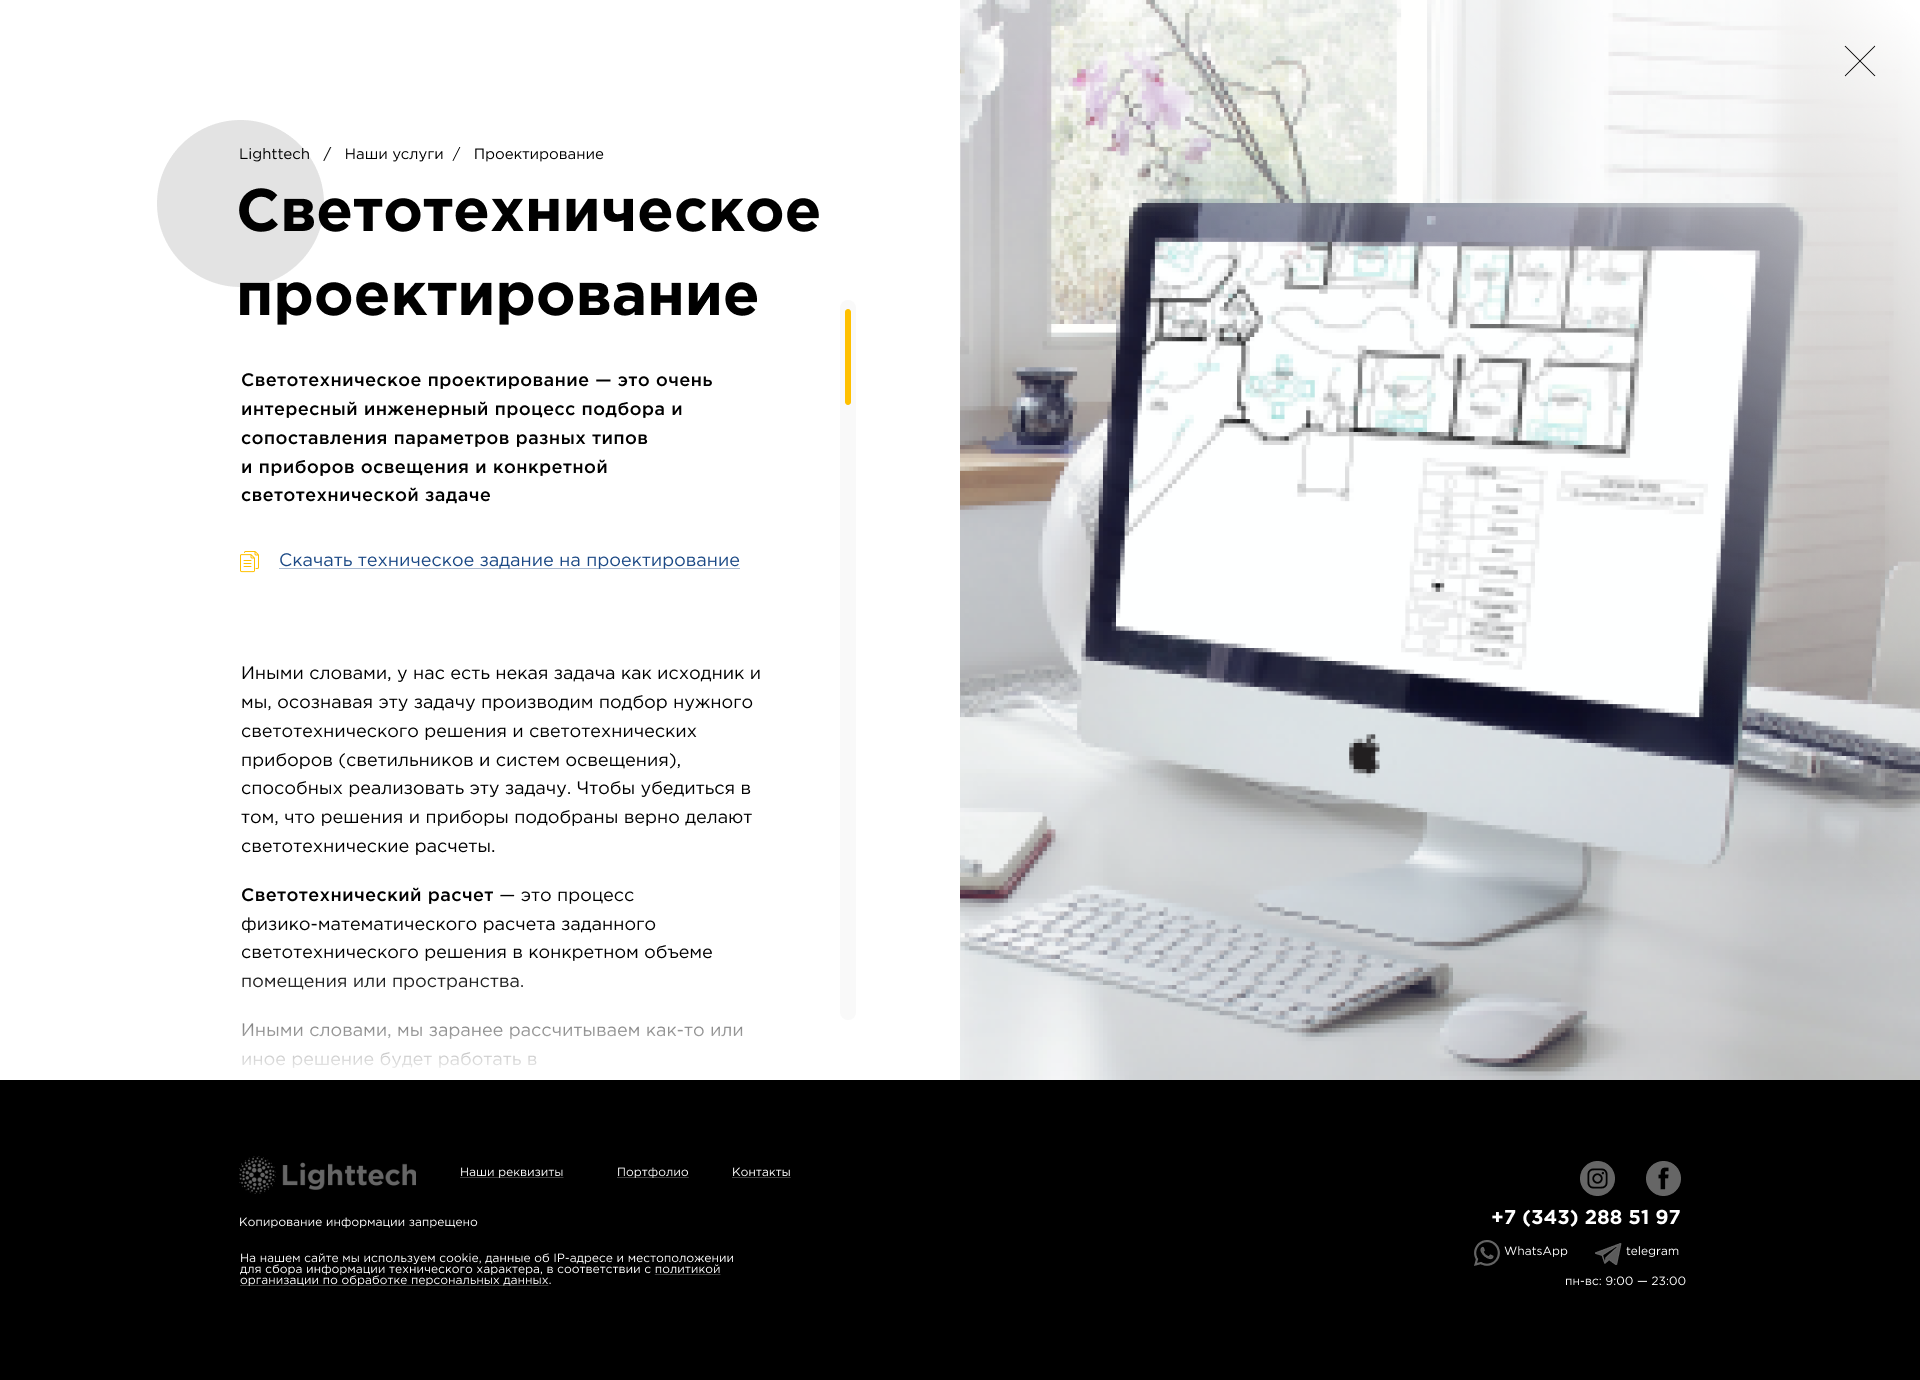 lighttech_usluga.png